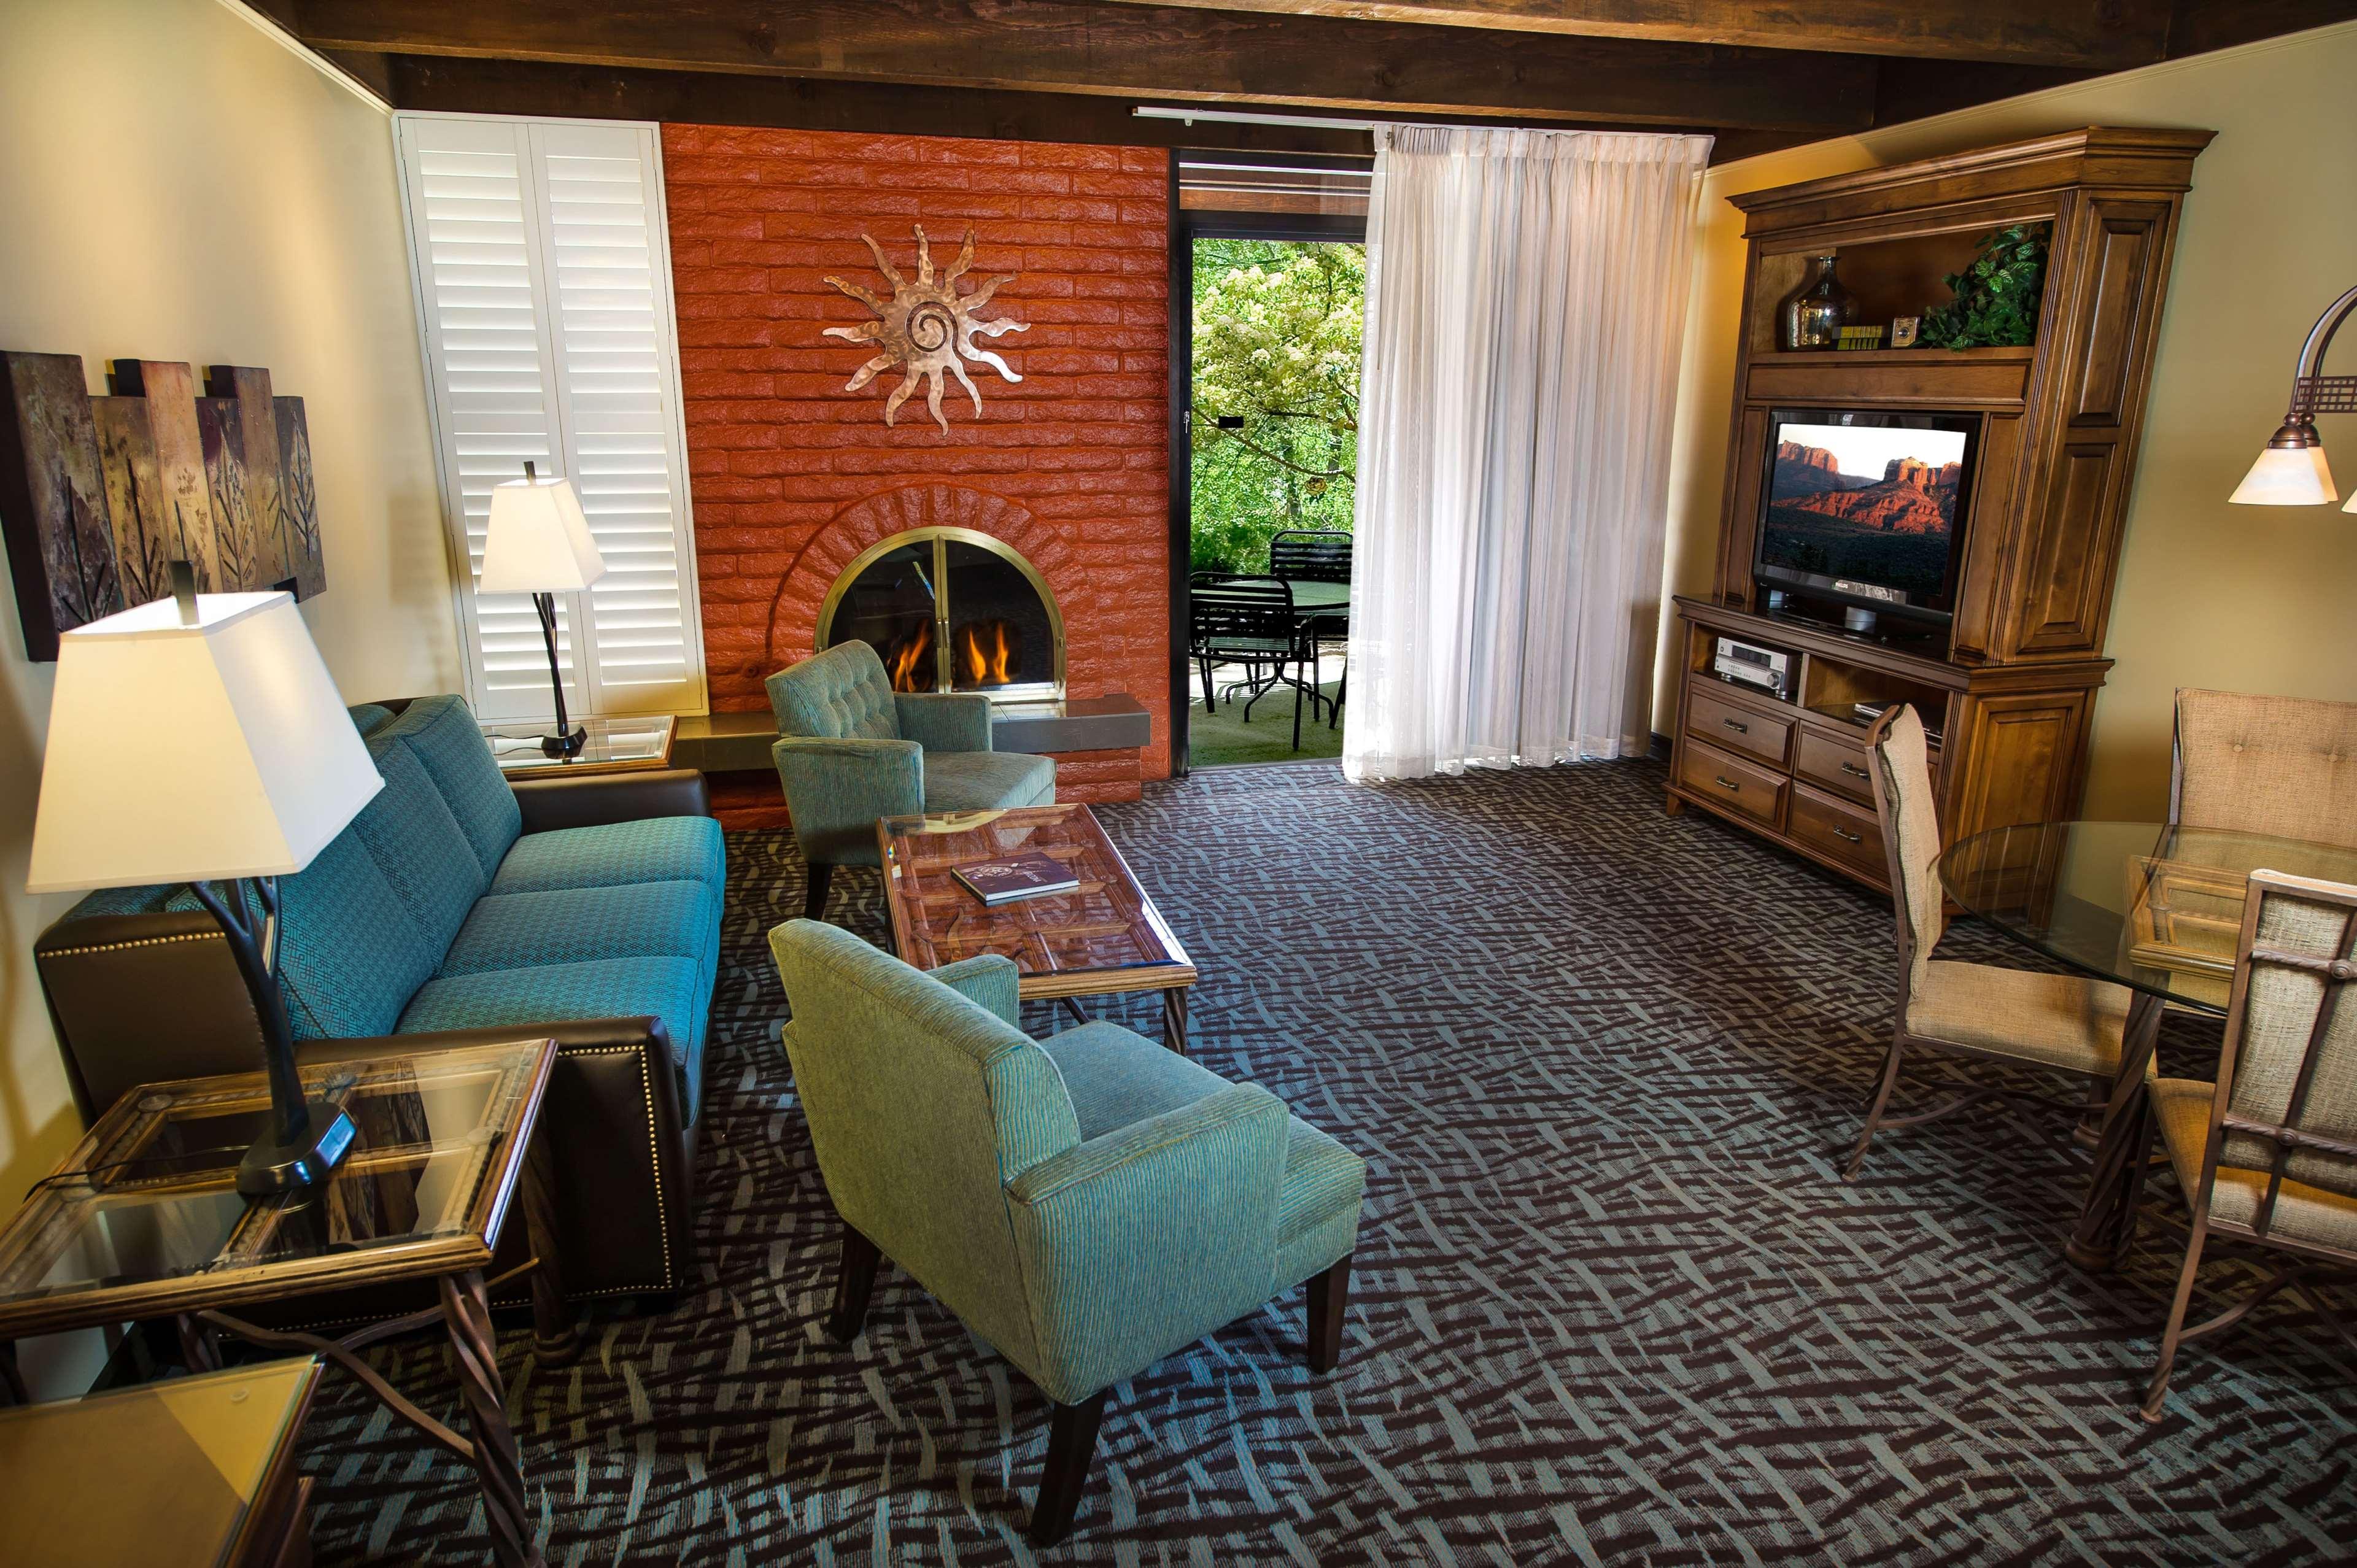 Best Western Plus Arroyo Roble Hotel & Creekside Villas image 27